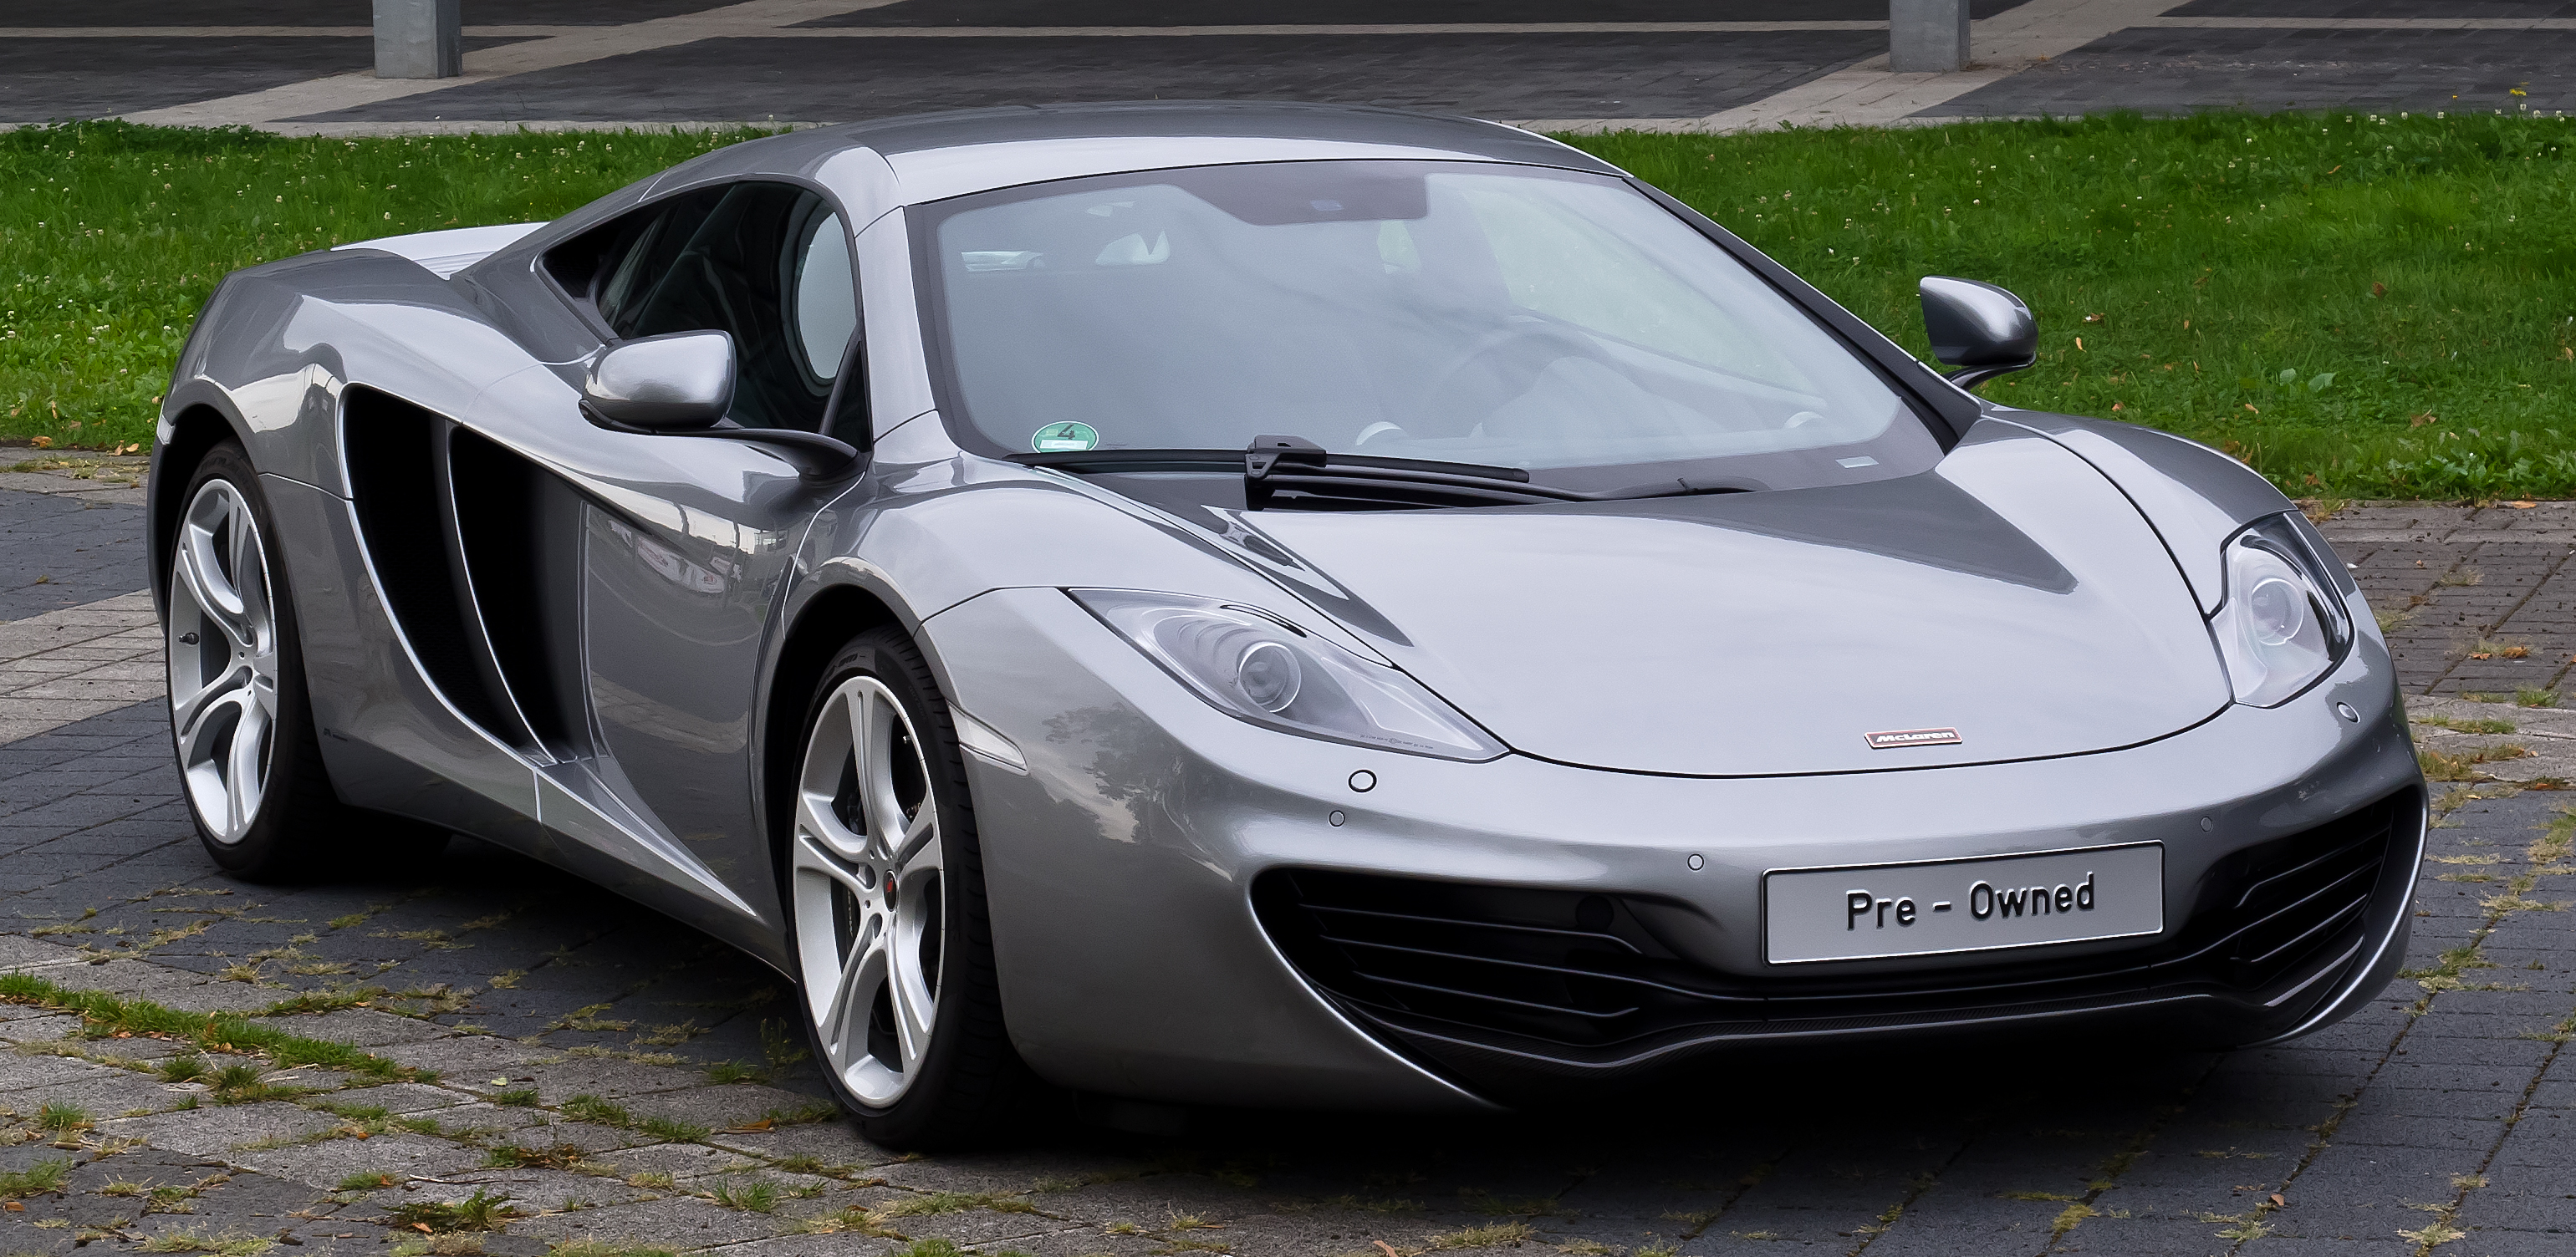 McLaren_MP4-12C_%E2%80%93_Frontansicht_%281%29%2C_30._August_2012%2C_D%C3%BCsseldorf Astounding Vauxhall Lotus Carlton 3.6 Twin Turbo for Sale Cars Trend